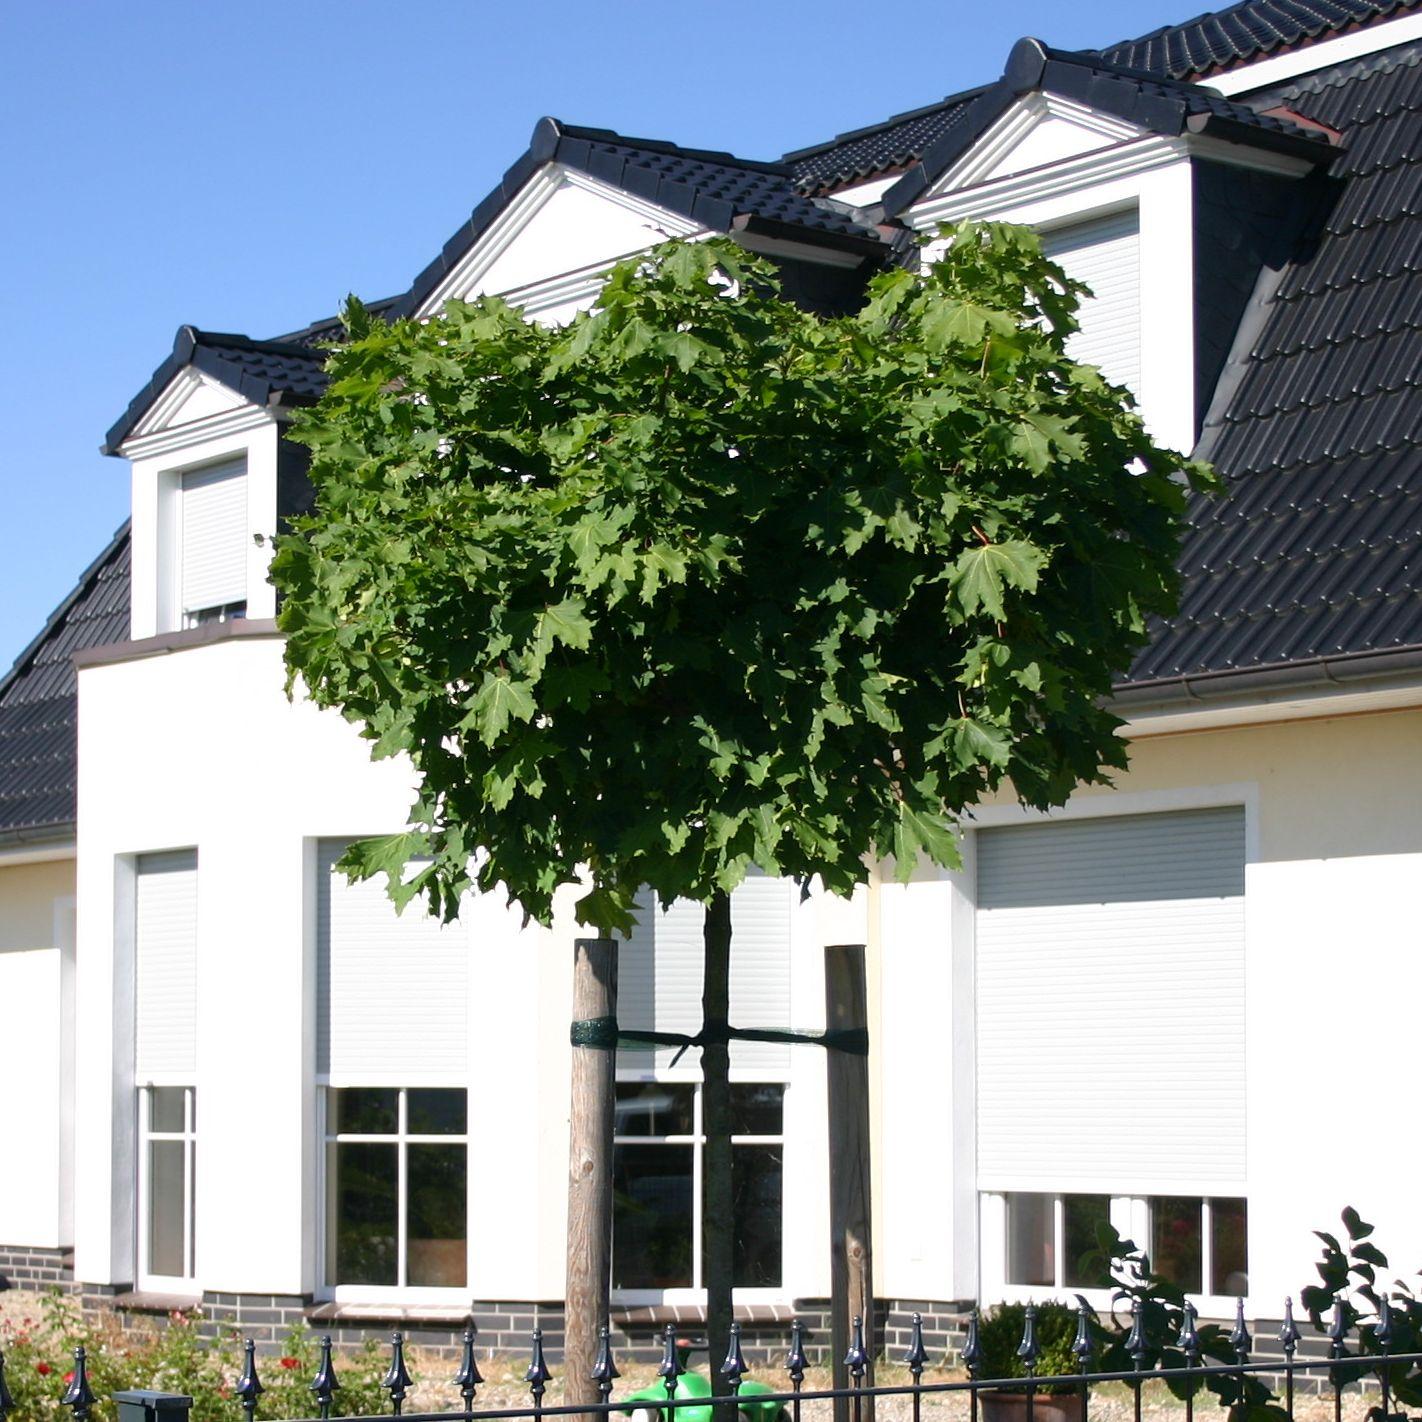 kugelahorn kugelbaum 39 globosum 39 acer platanoides 39 globosum 39 pflanzenschleuder. Black Bedroom Furniture Sets. Home Design Ideas